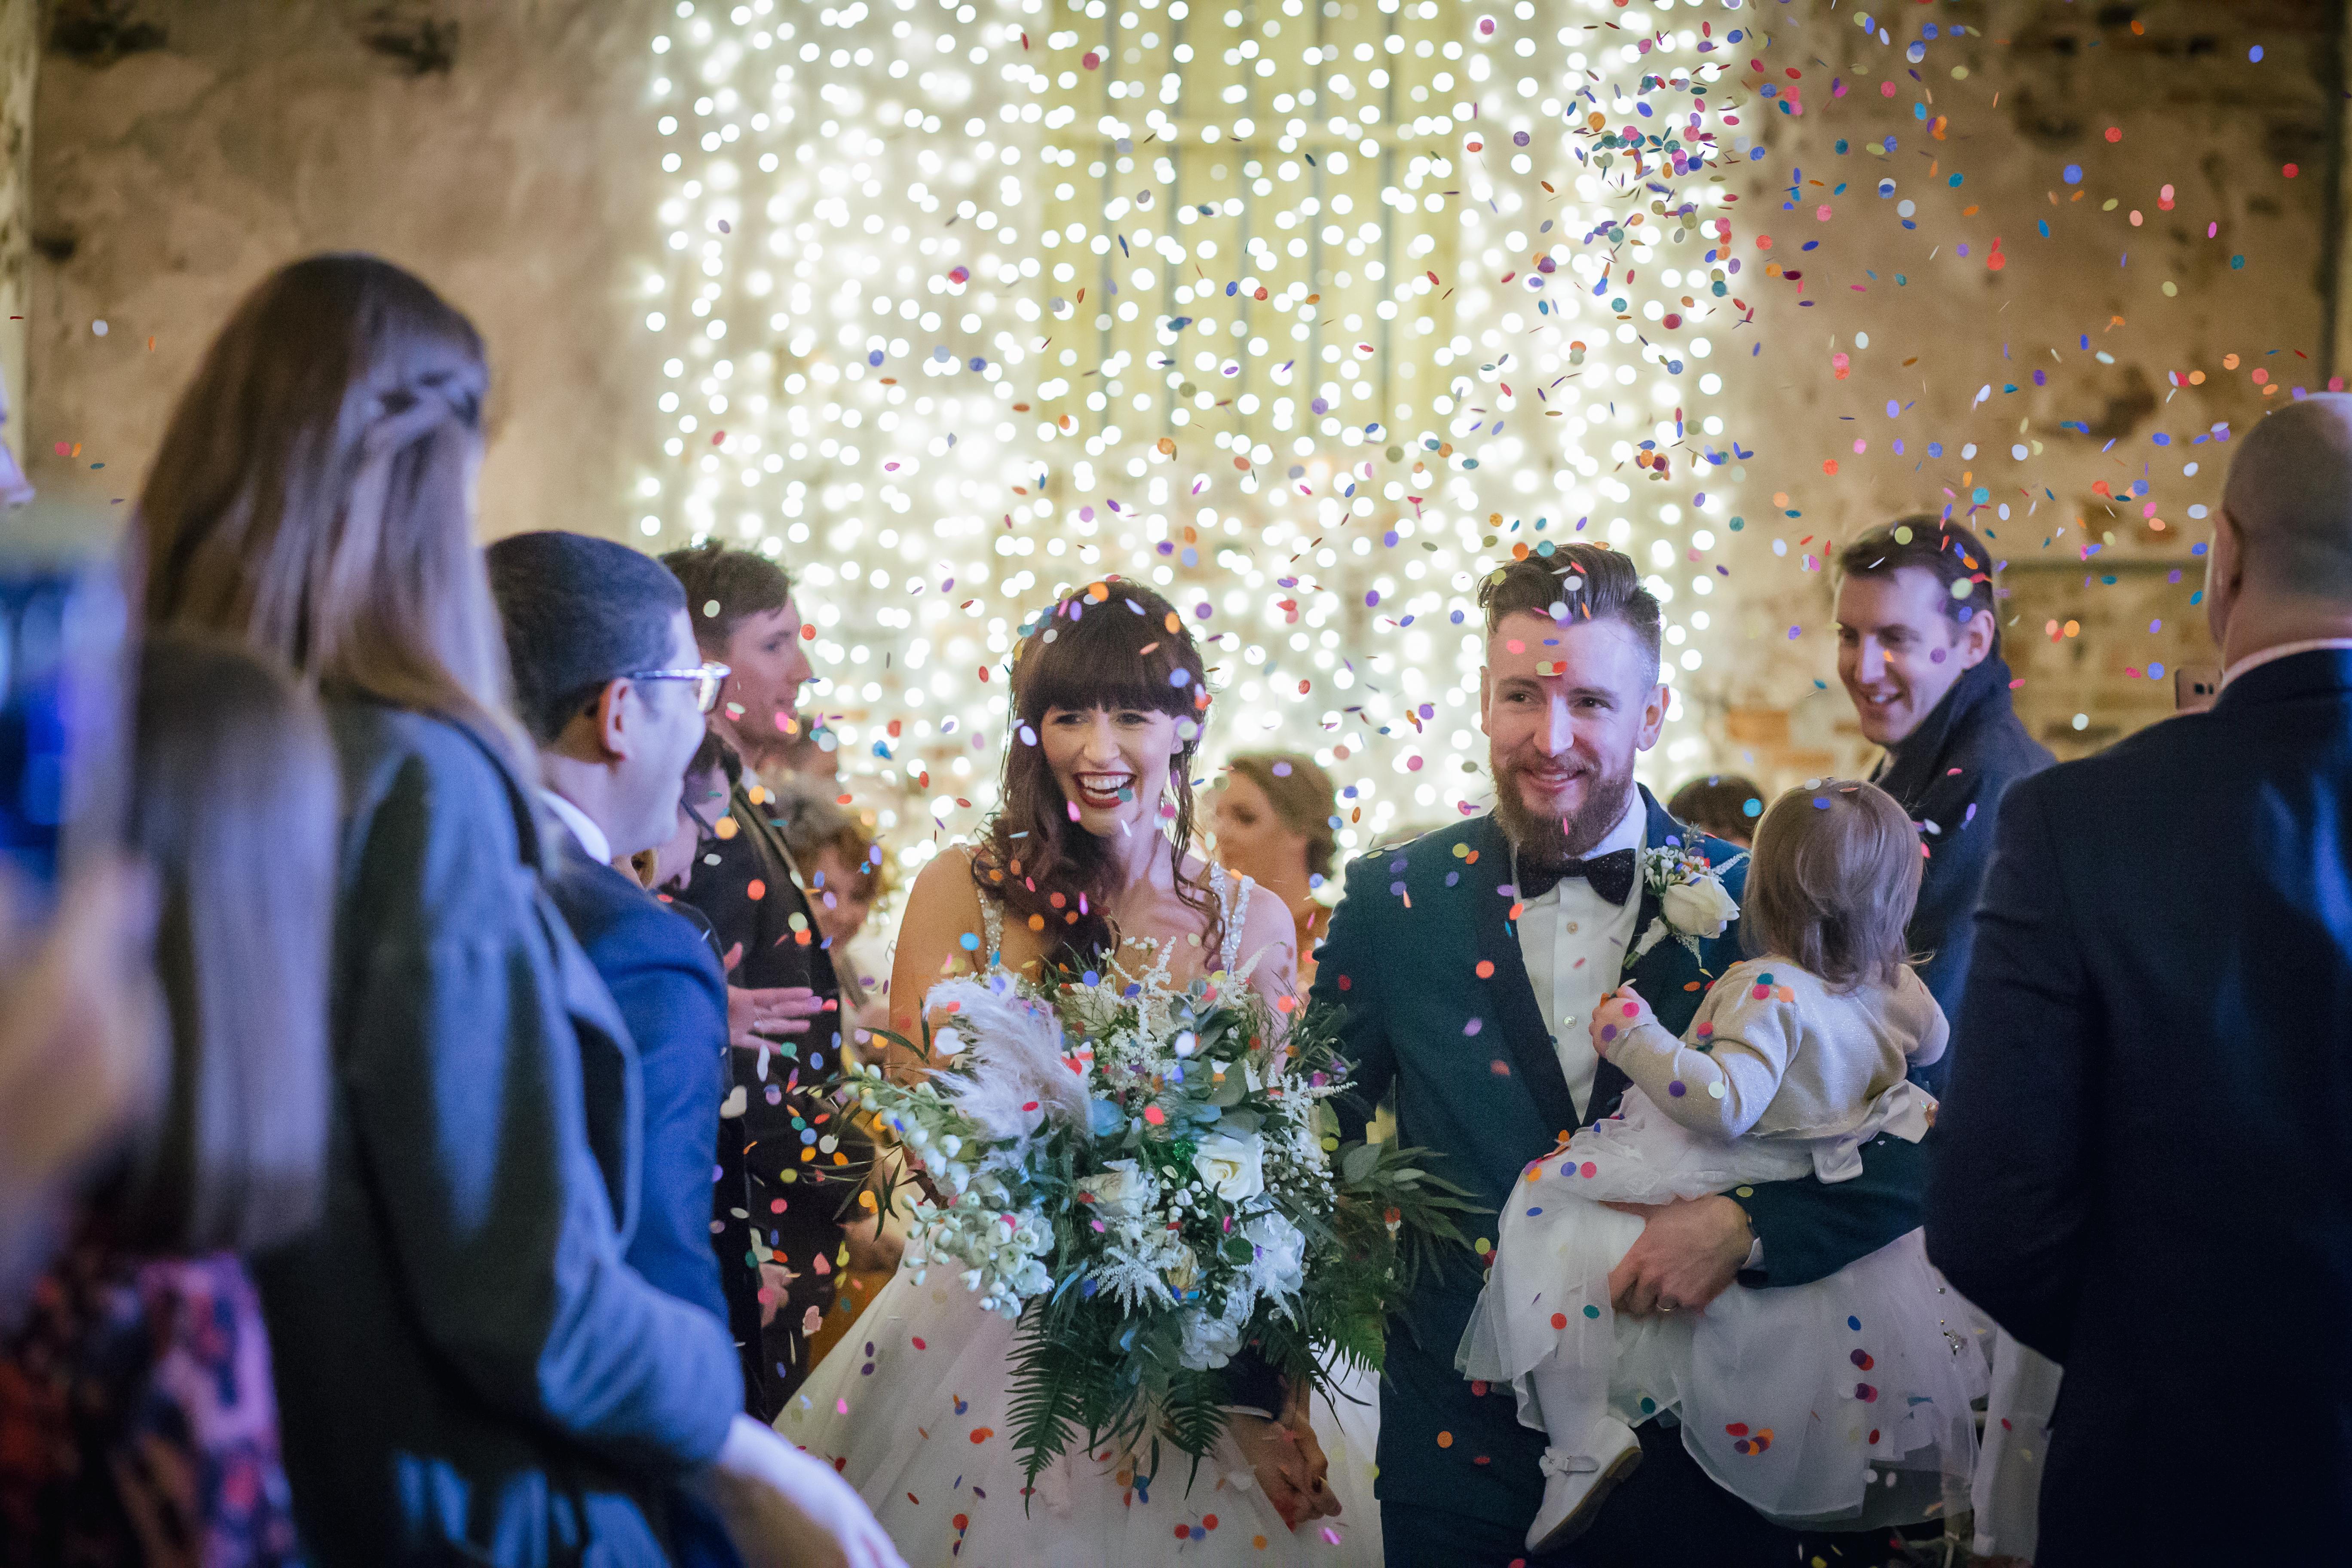 The Normans weddings confetti